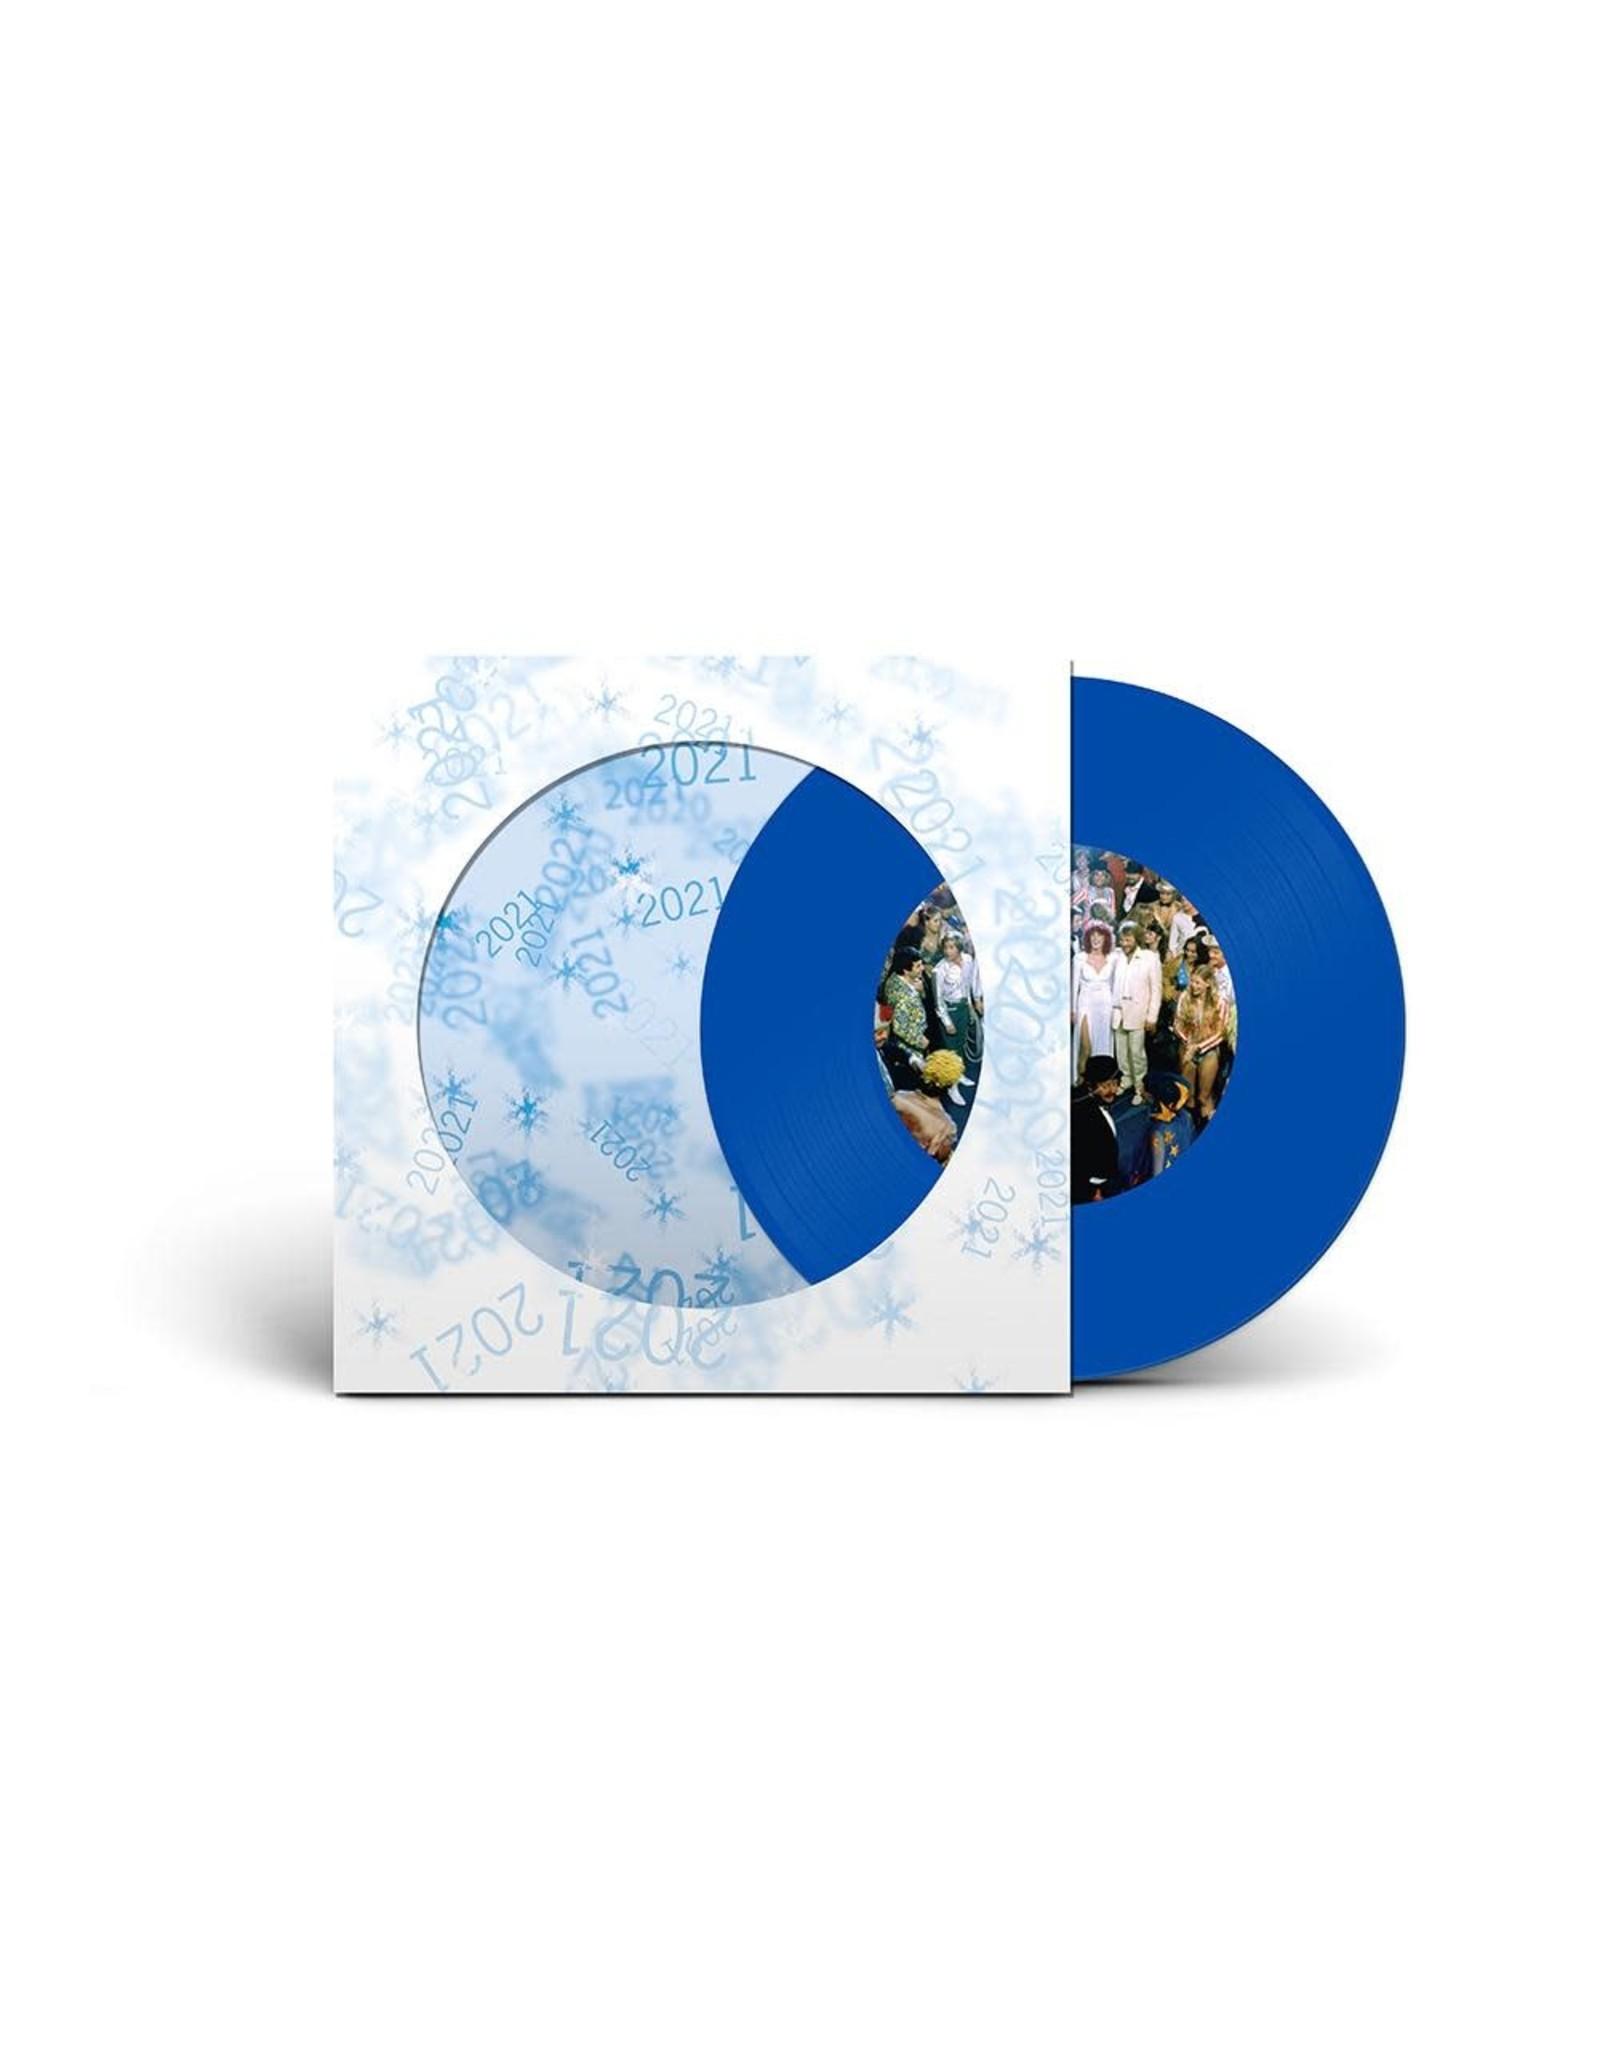 "ABBA - Happy New Year 2021 (7"" Single) [Blue Vinyl]"